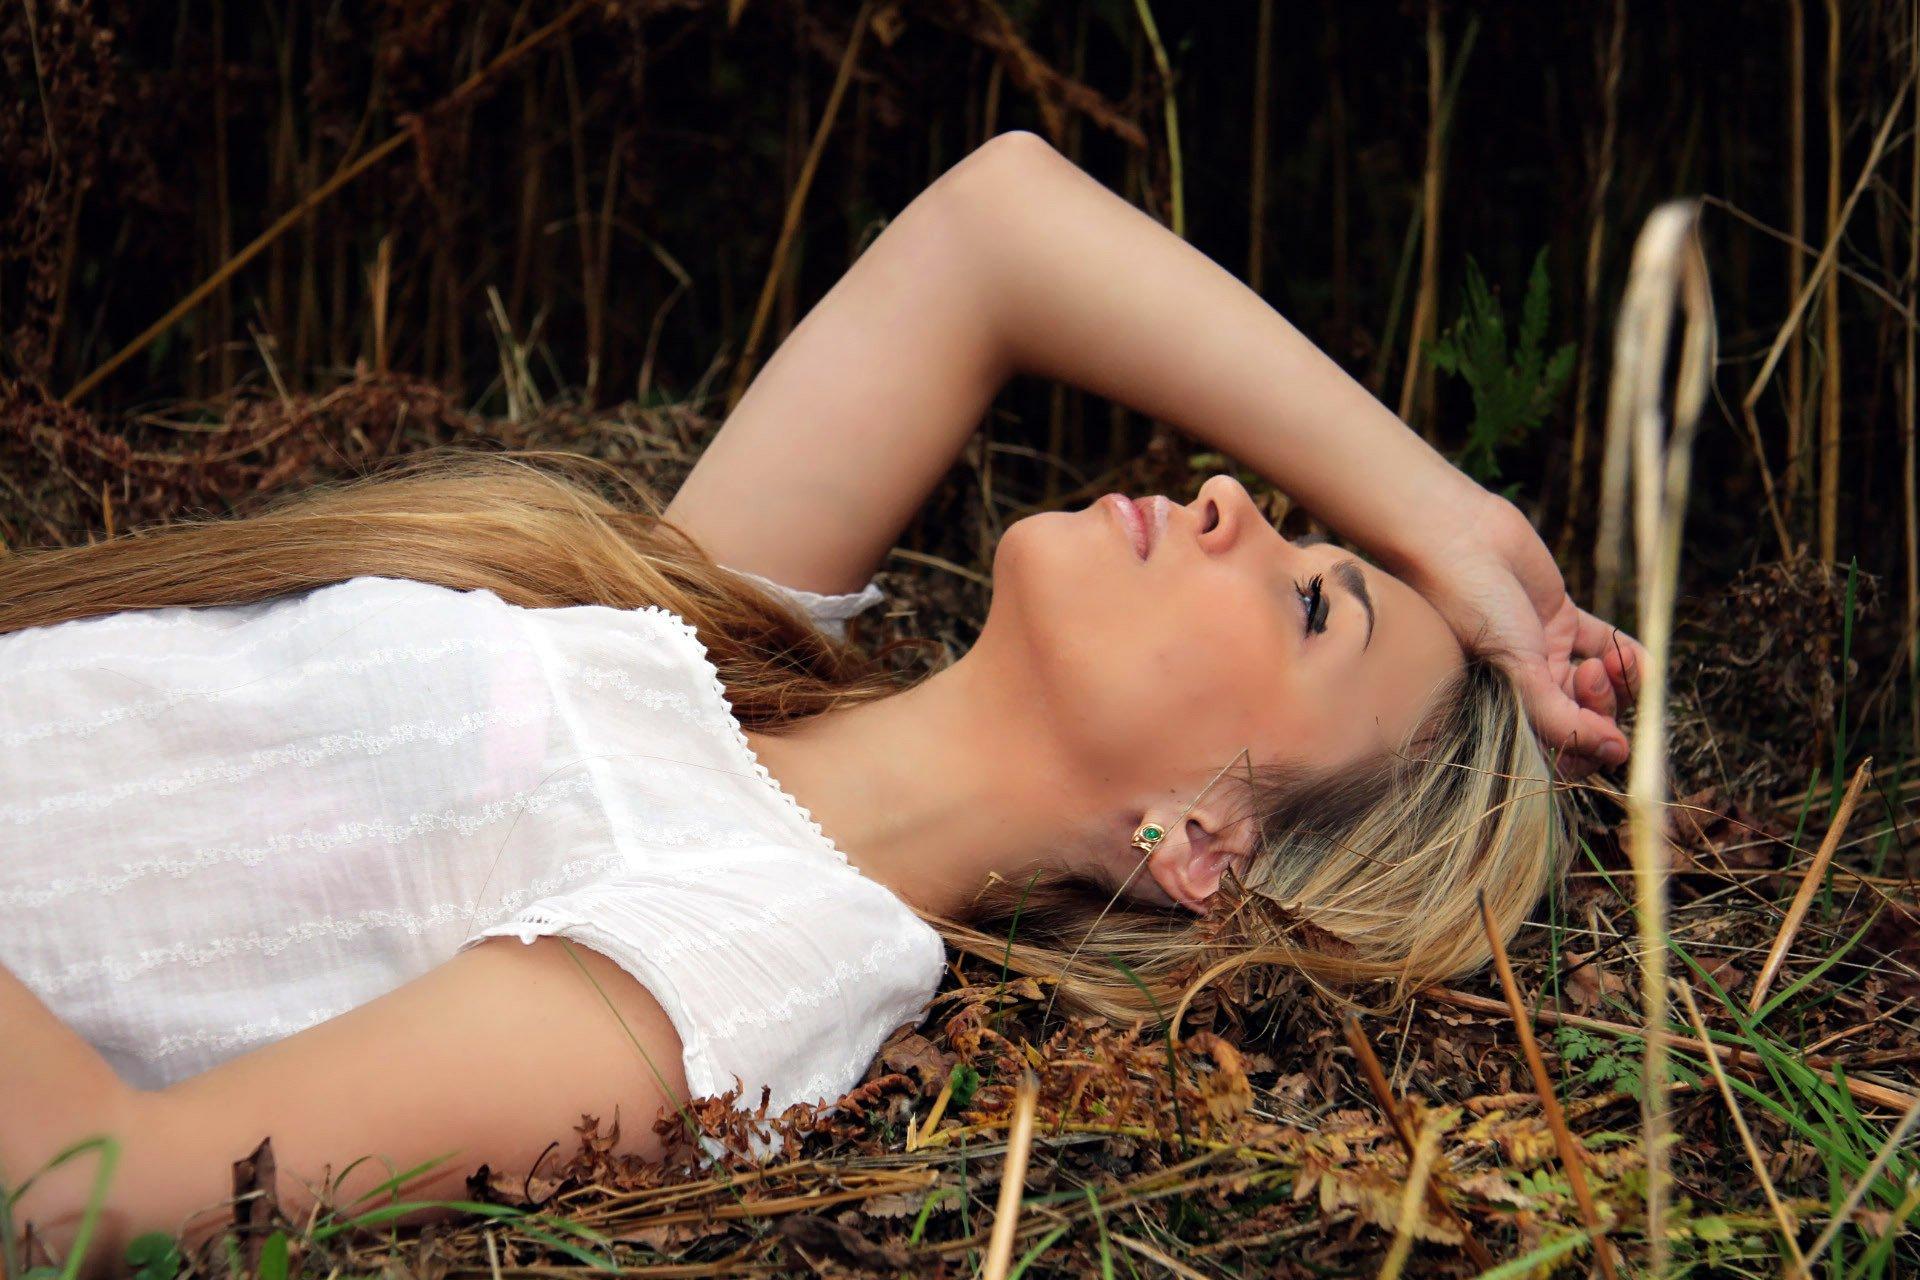 blondinki-na-prirode-foto-foto